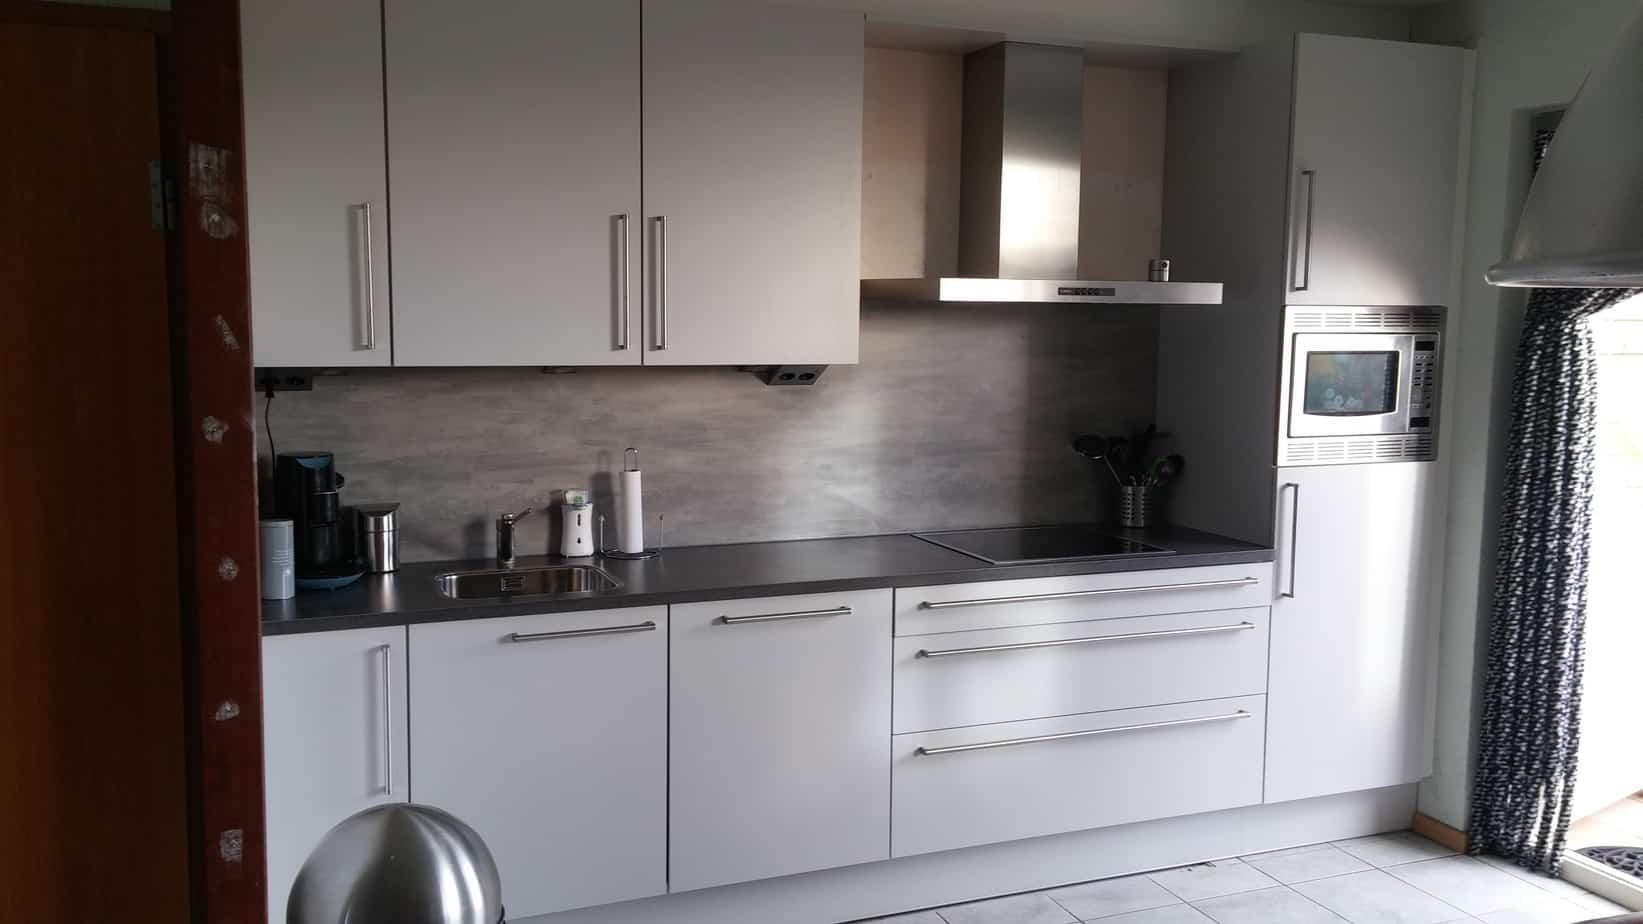 Vaak Oude Keuken Opknappen. Awesome Zandstralen Keuken Voor Zandstralen &ZR83